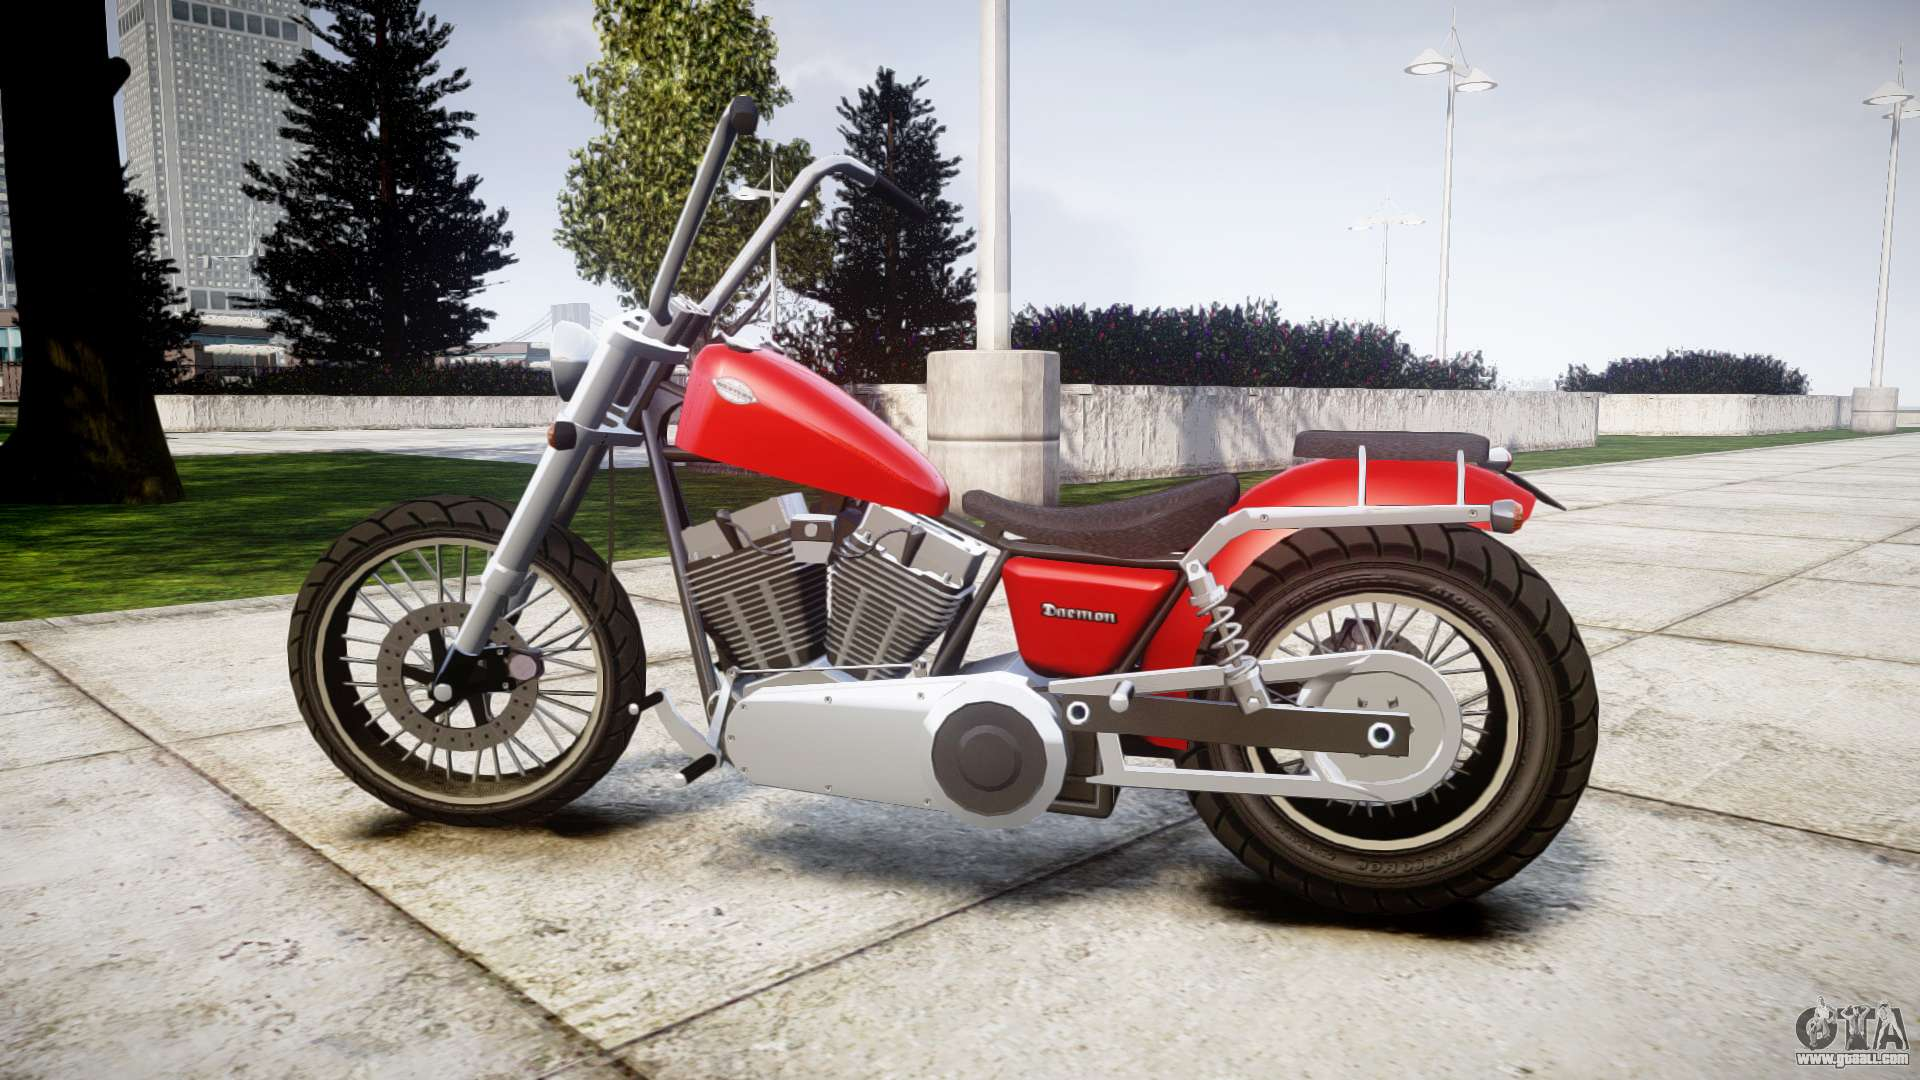 Western Motorcycle Company Daemon for GTA 4 Gta V Western Daemon